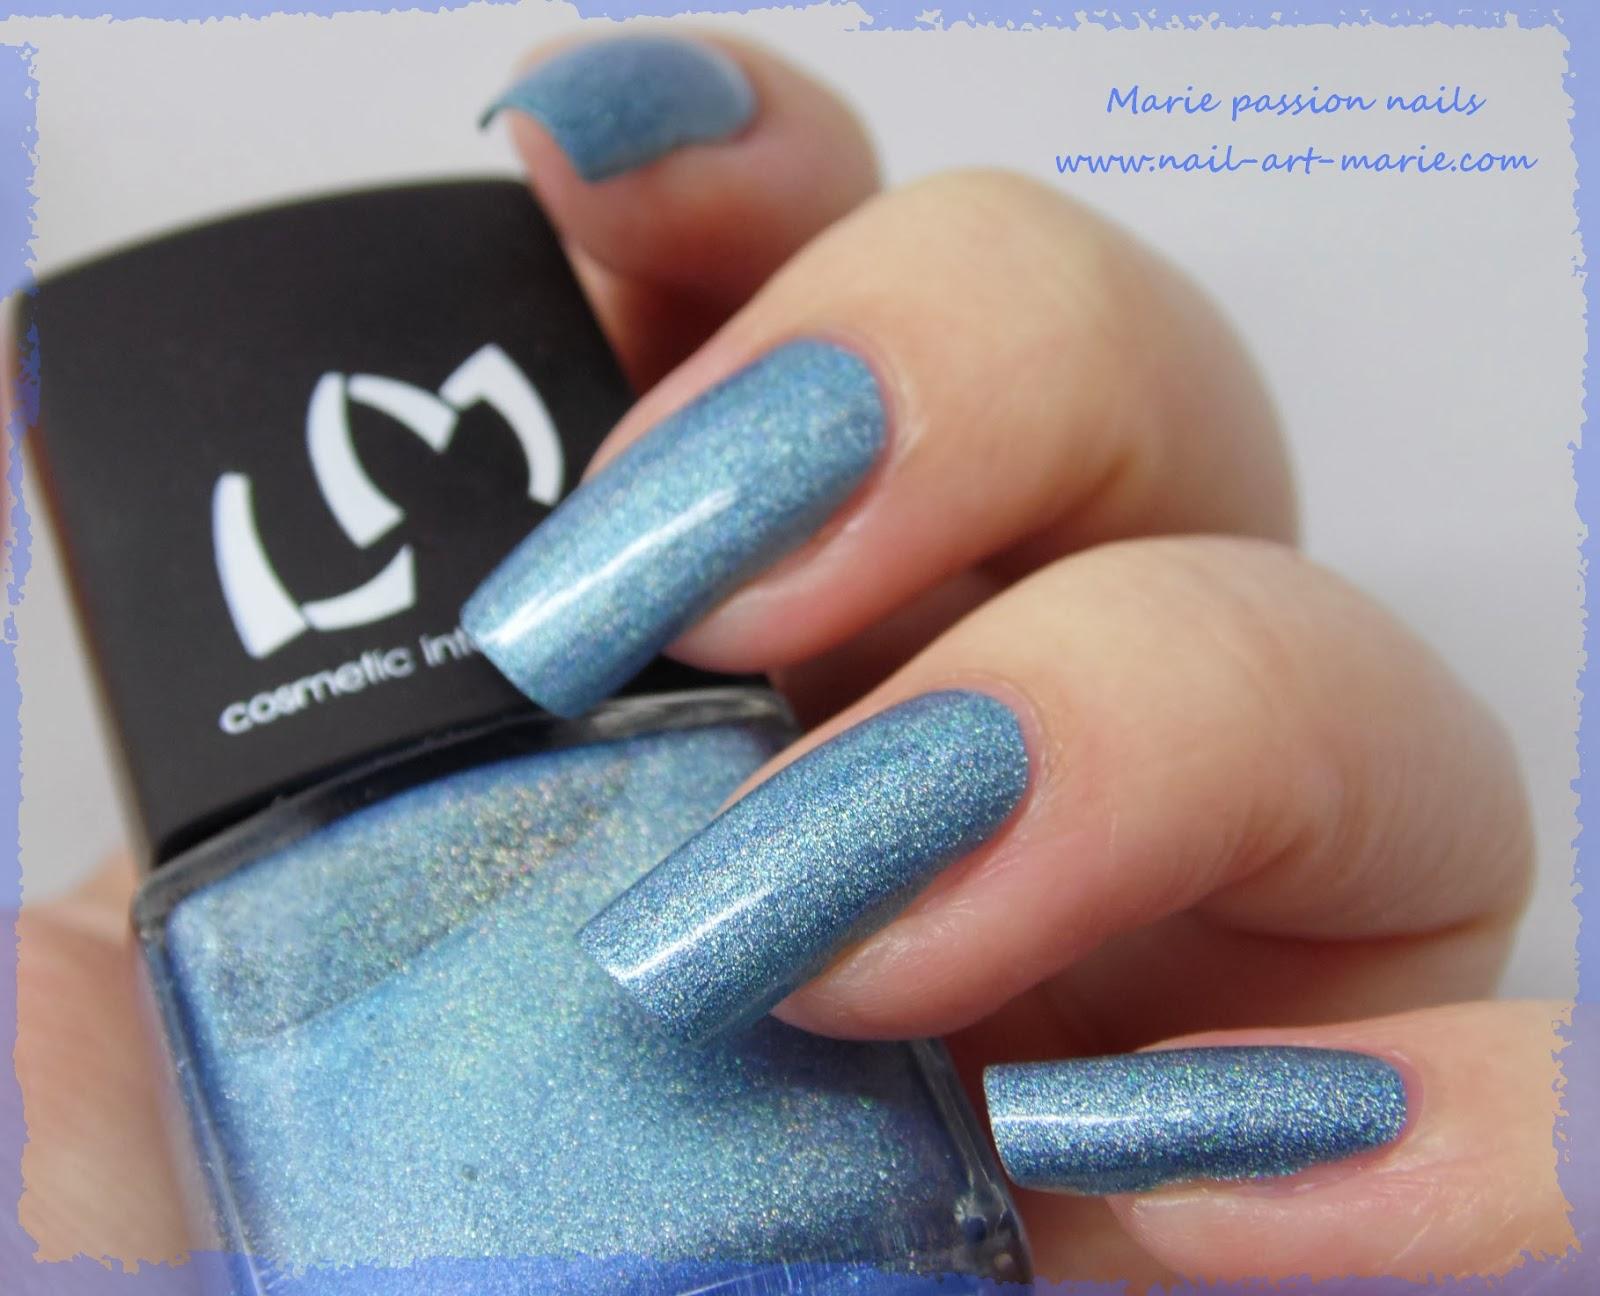 LM Cosmetic Nunki6